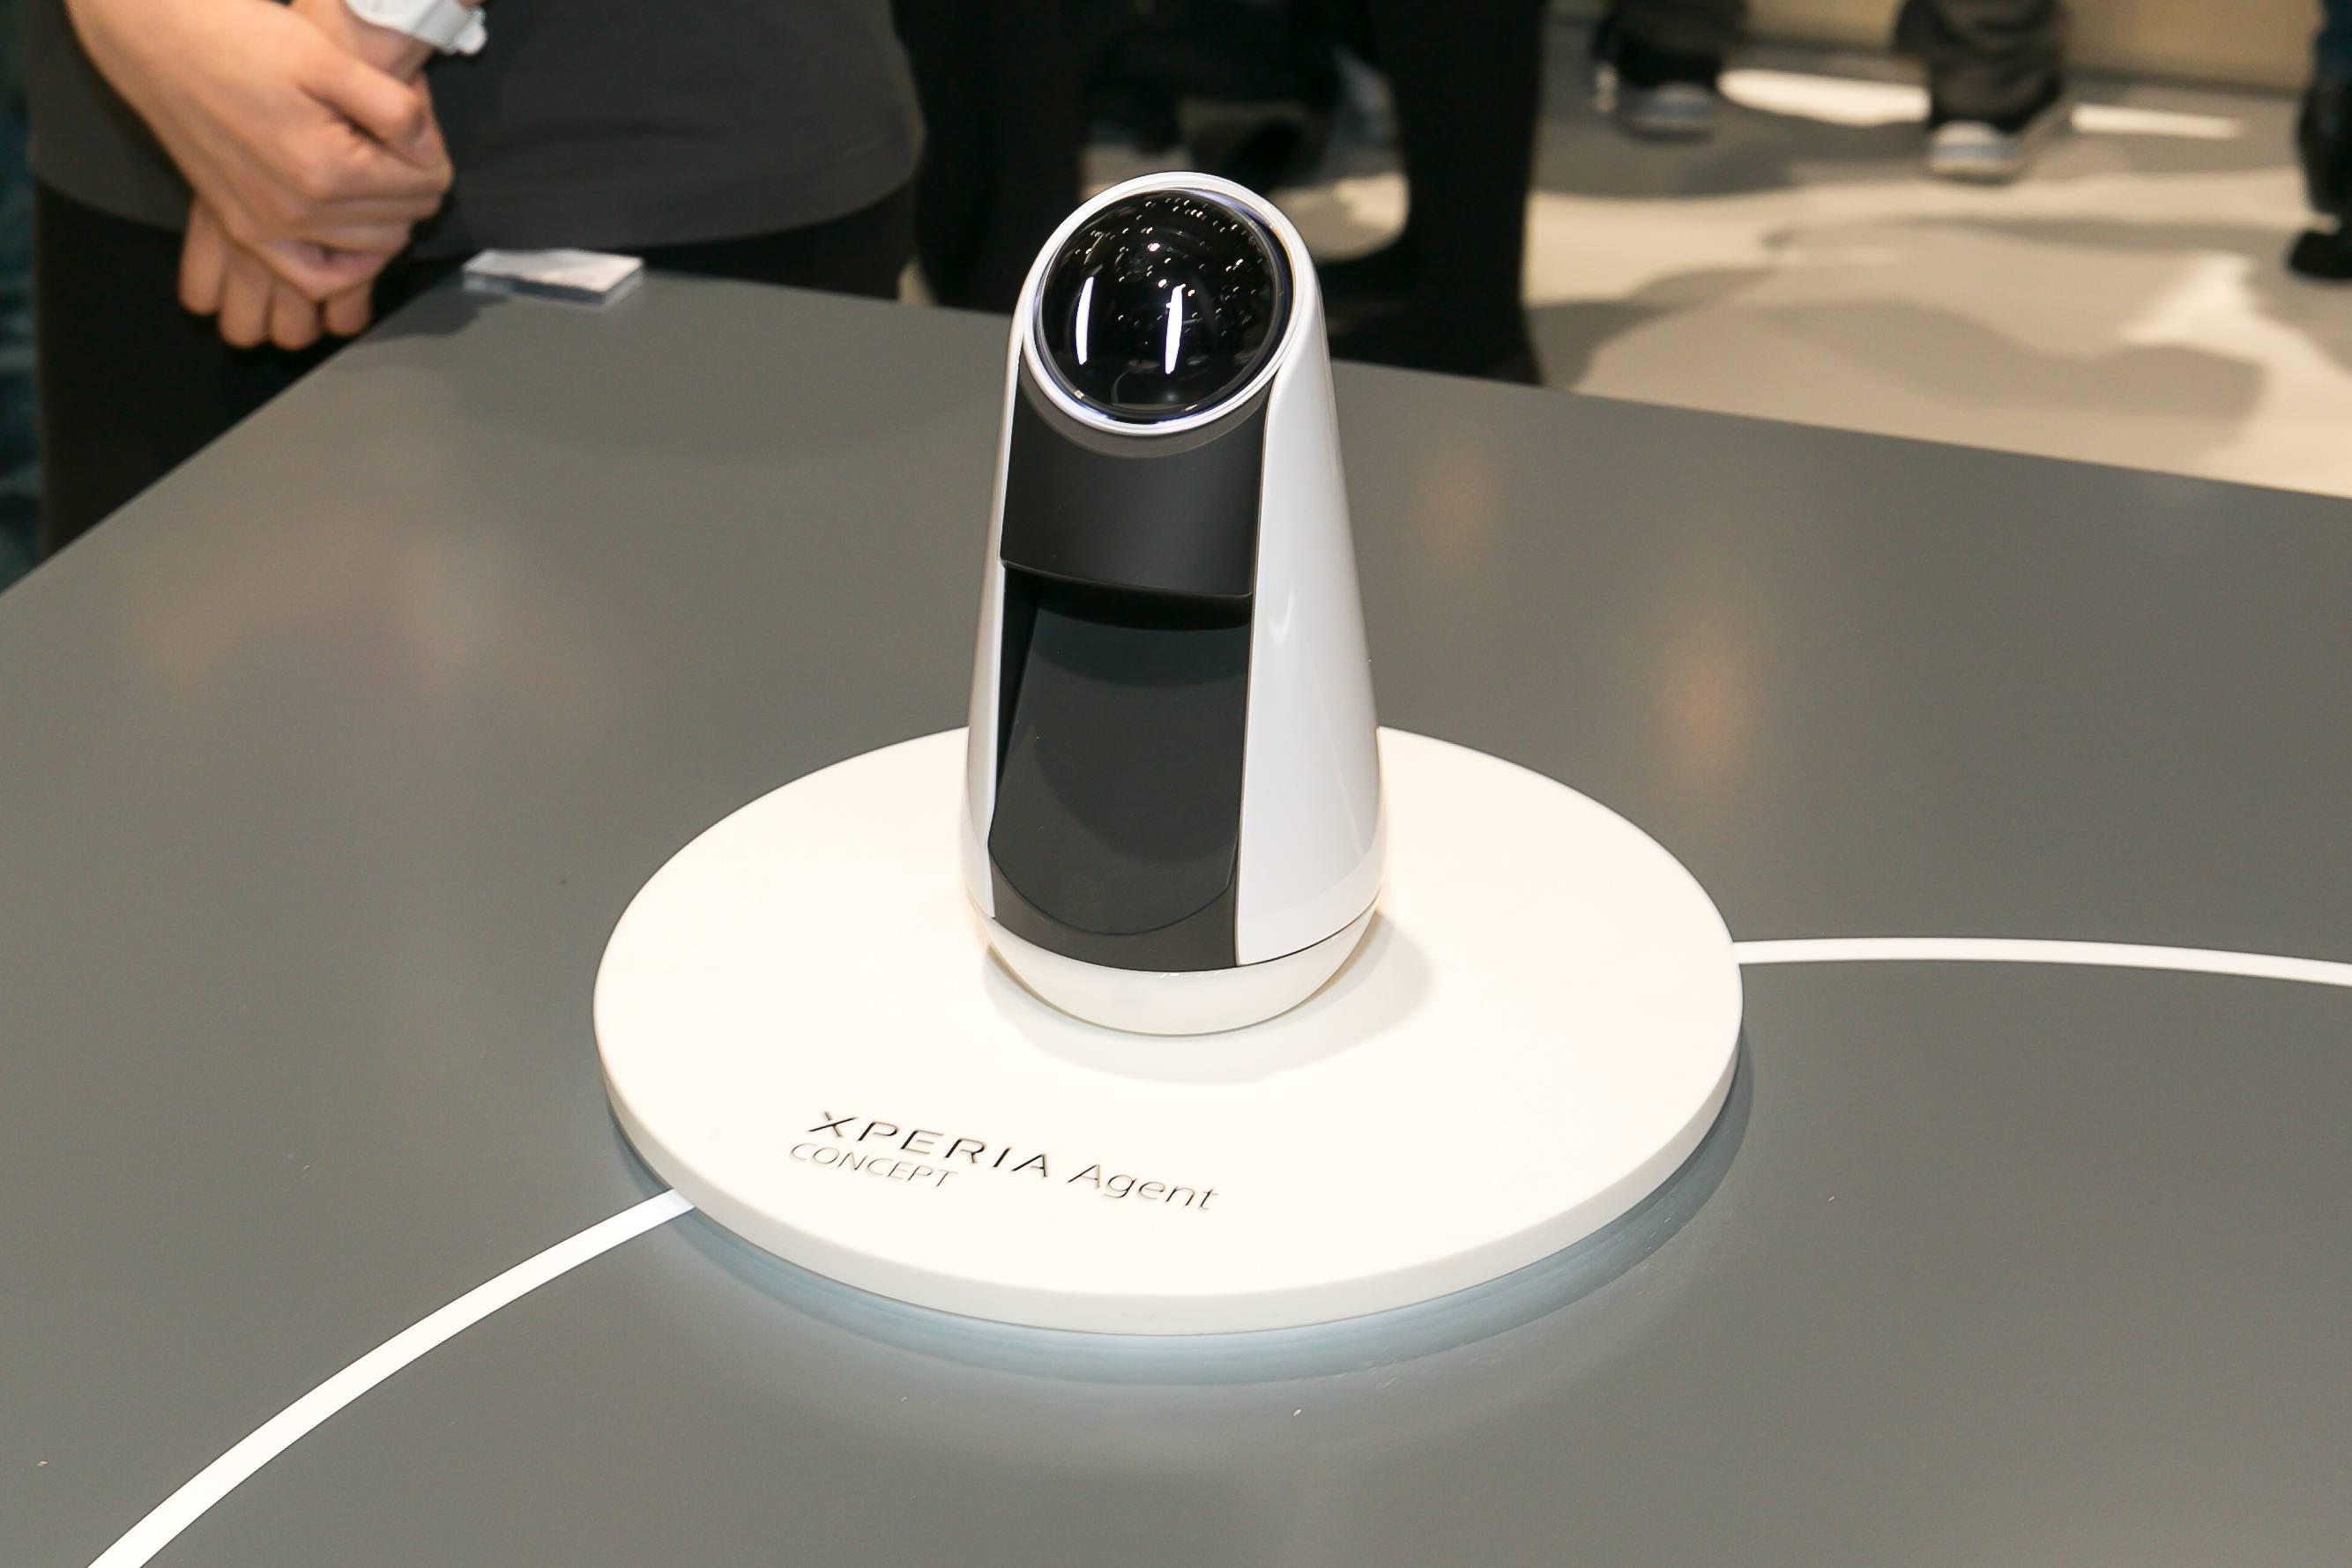 Xperia Agent je koncept 360°kamery od Sony